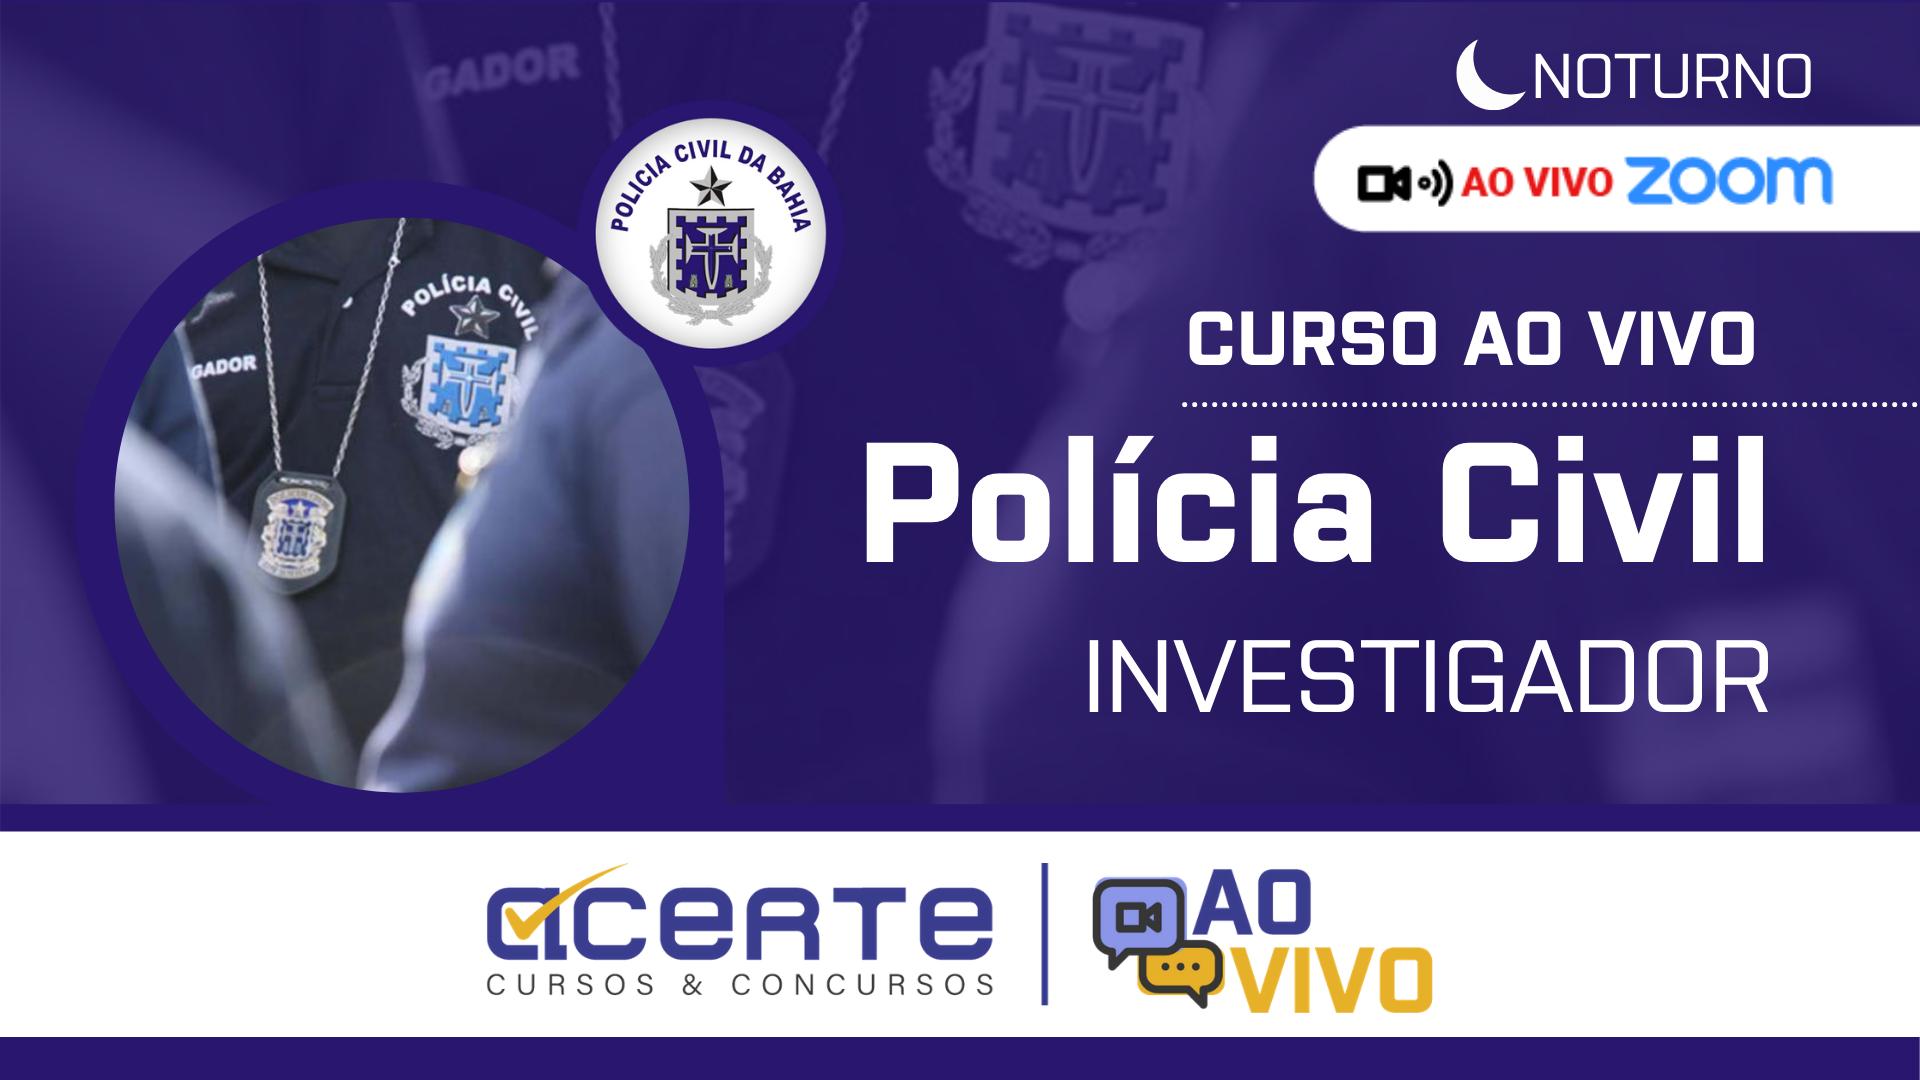 Polícia Civil - PC - Investigador AO VIVO - Noturno